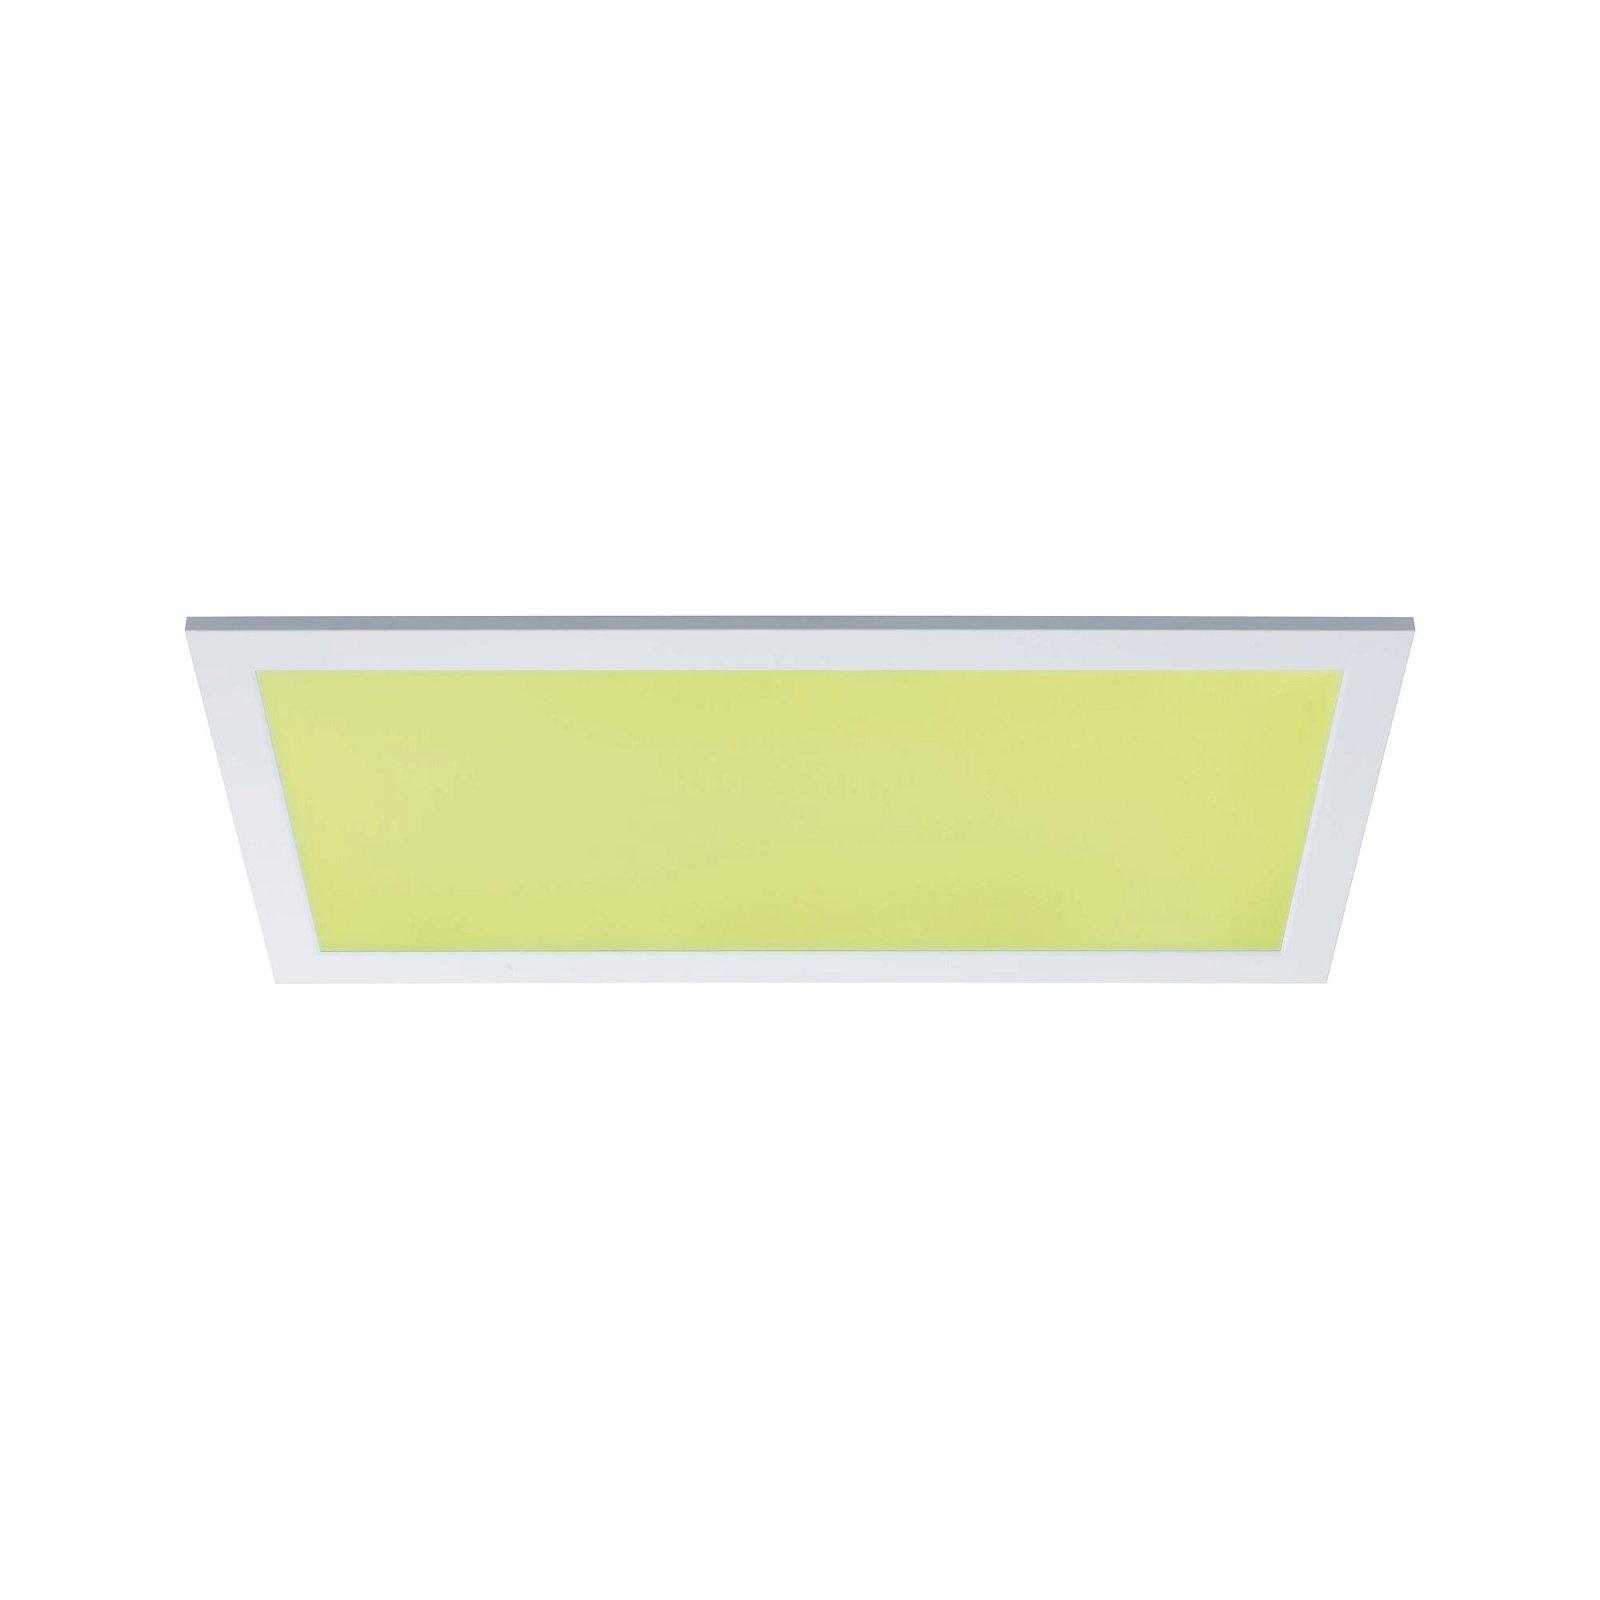 LED Panel Smart Home Zigbee Amaris square 595x295mm 2300lm RGBW Matt white